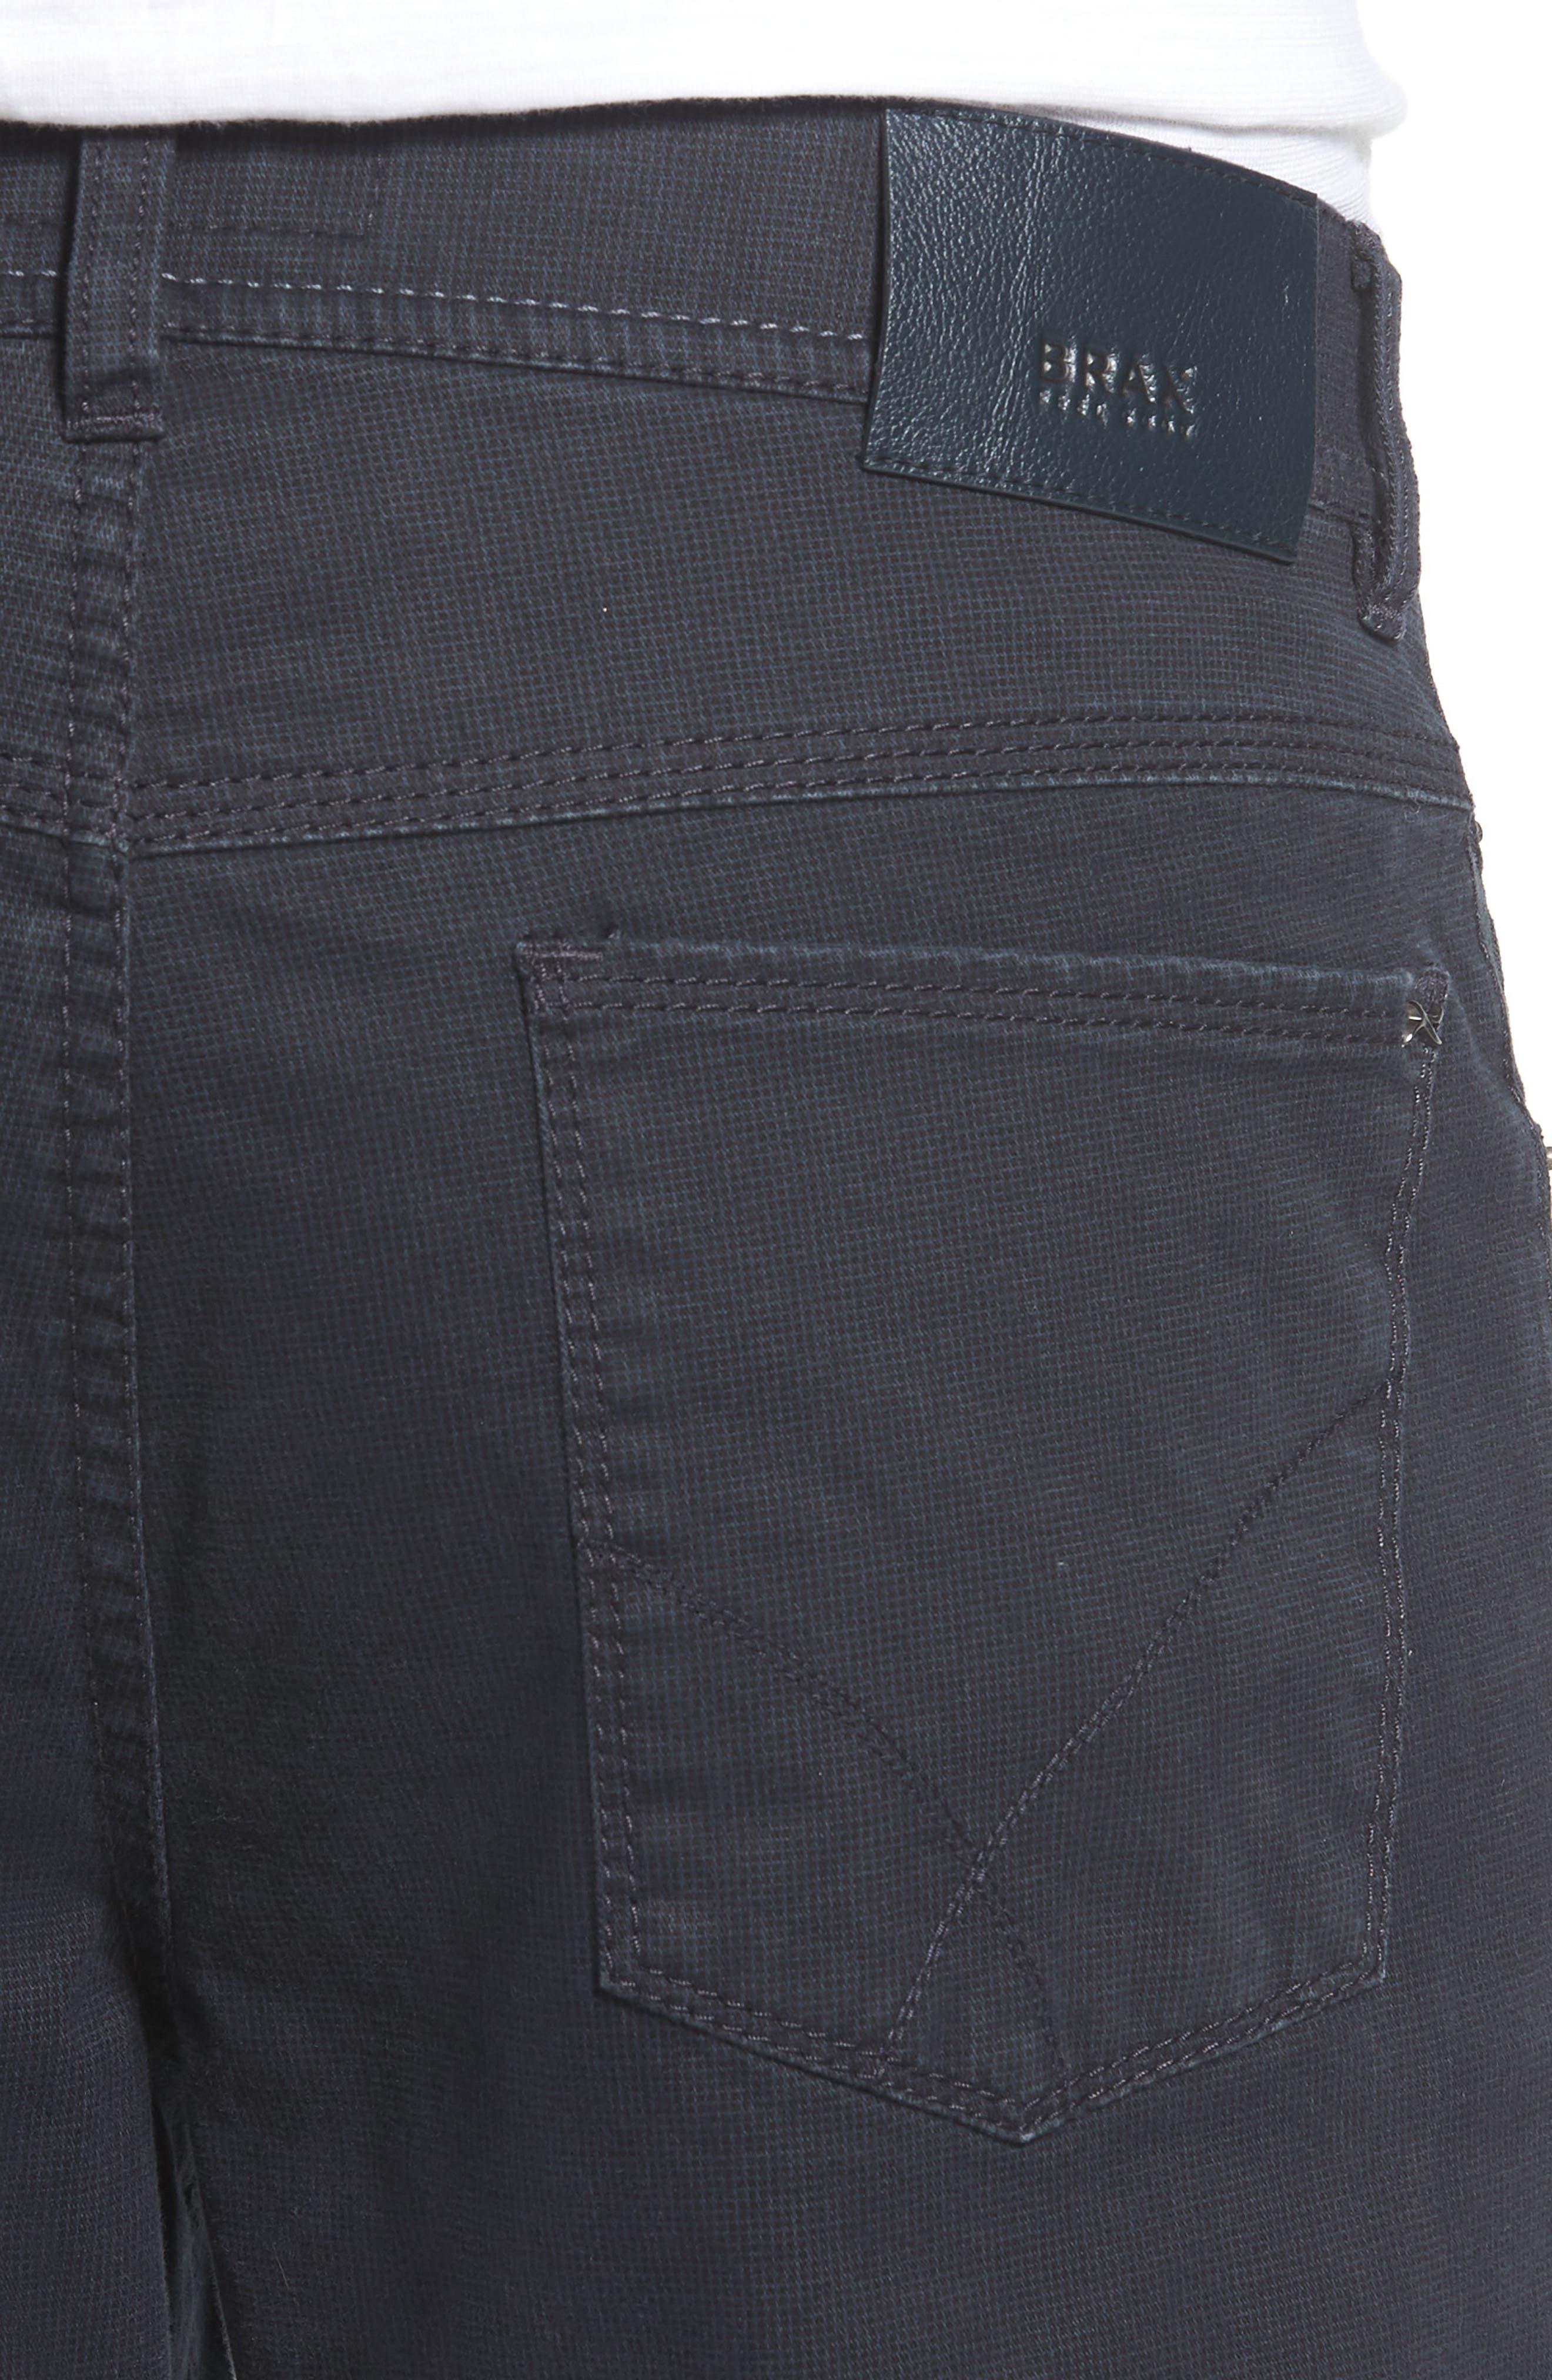 Neat Print Stretch Cotton Pants,                             Alternate thumbnail 4, color,                             410